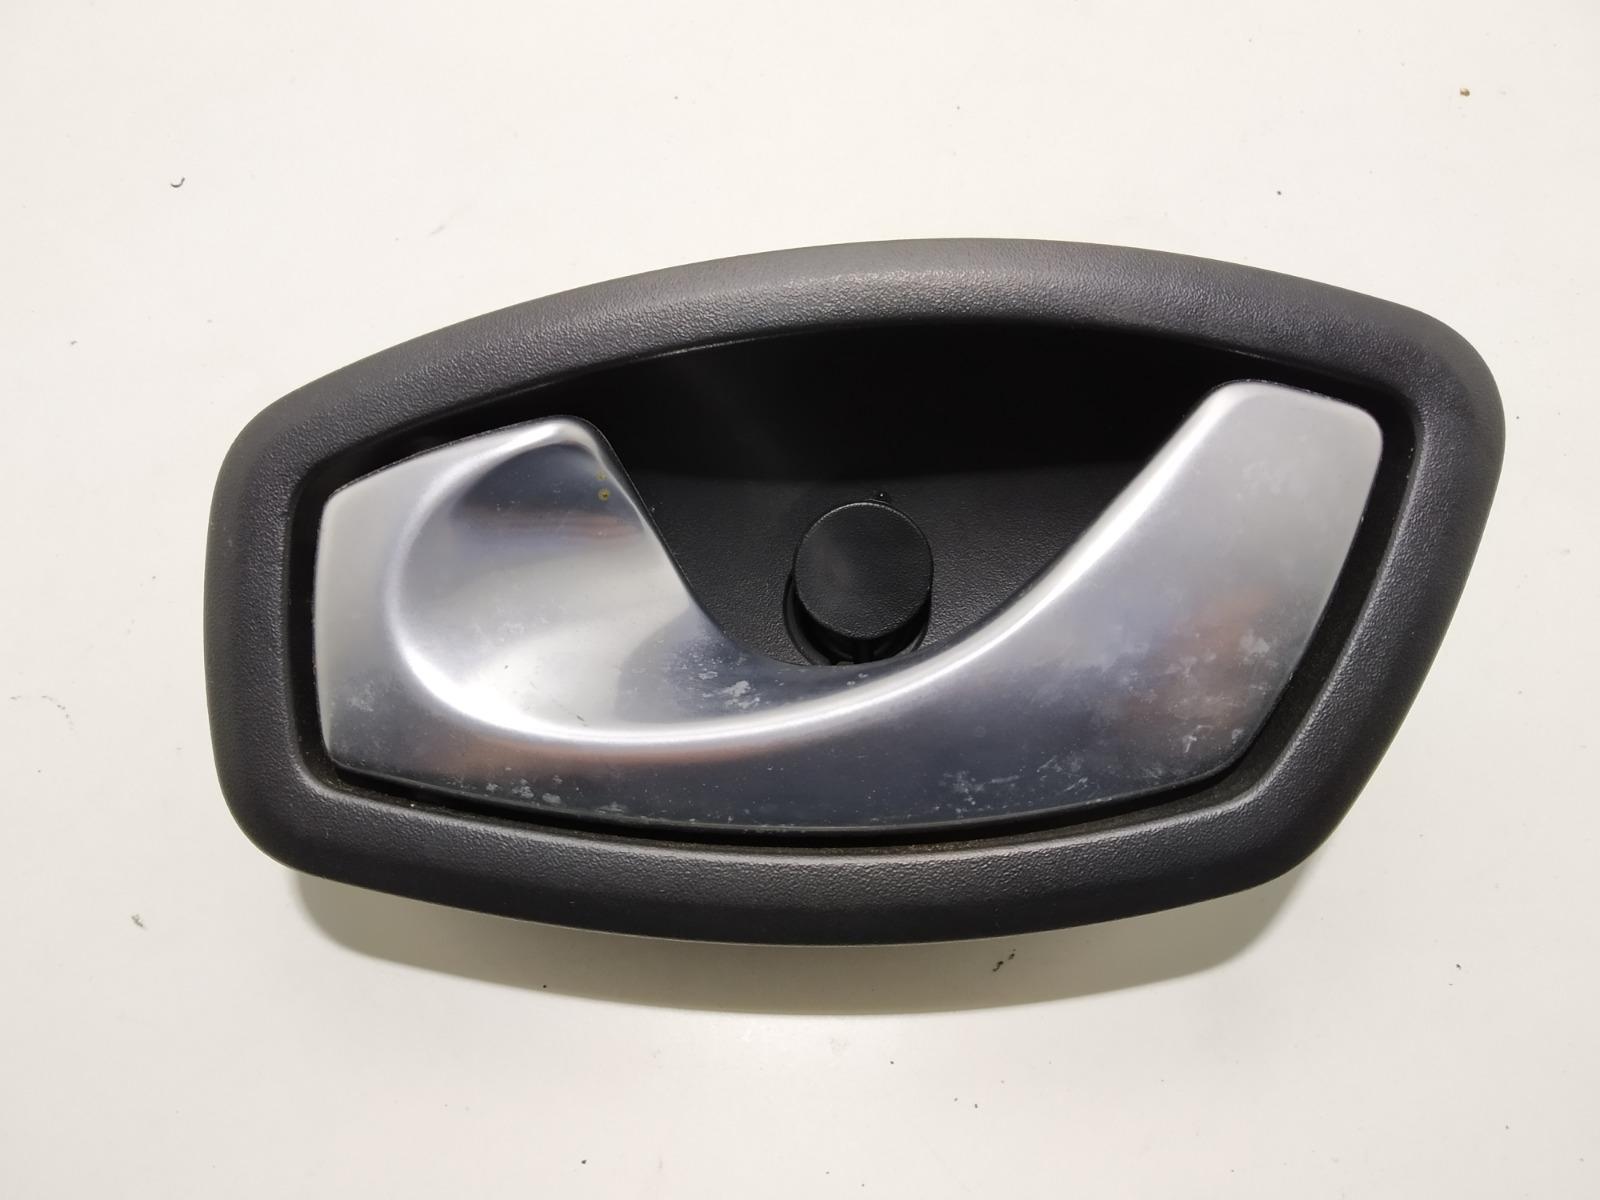 Ручка внутренняя передняя левая Renault Megane 1.5 DCI 2009 (б/у)